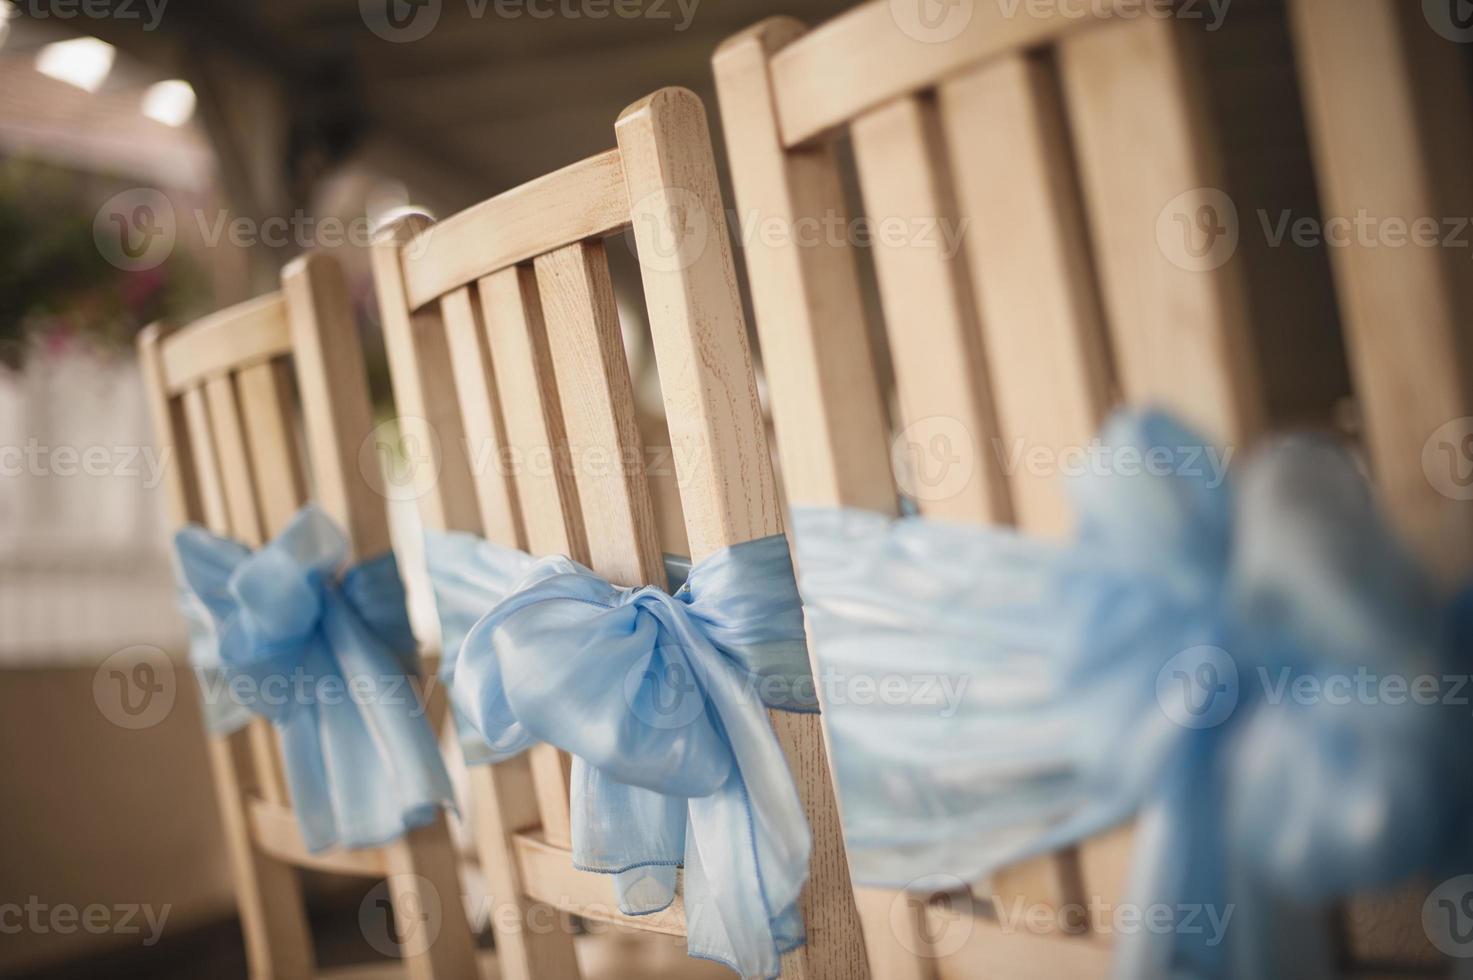 cadeiras de casamento decoradas na cor azul foto